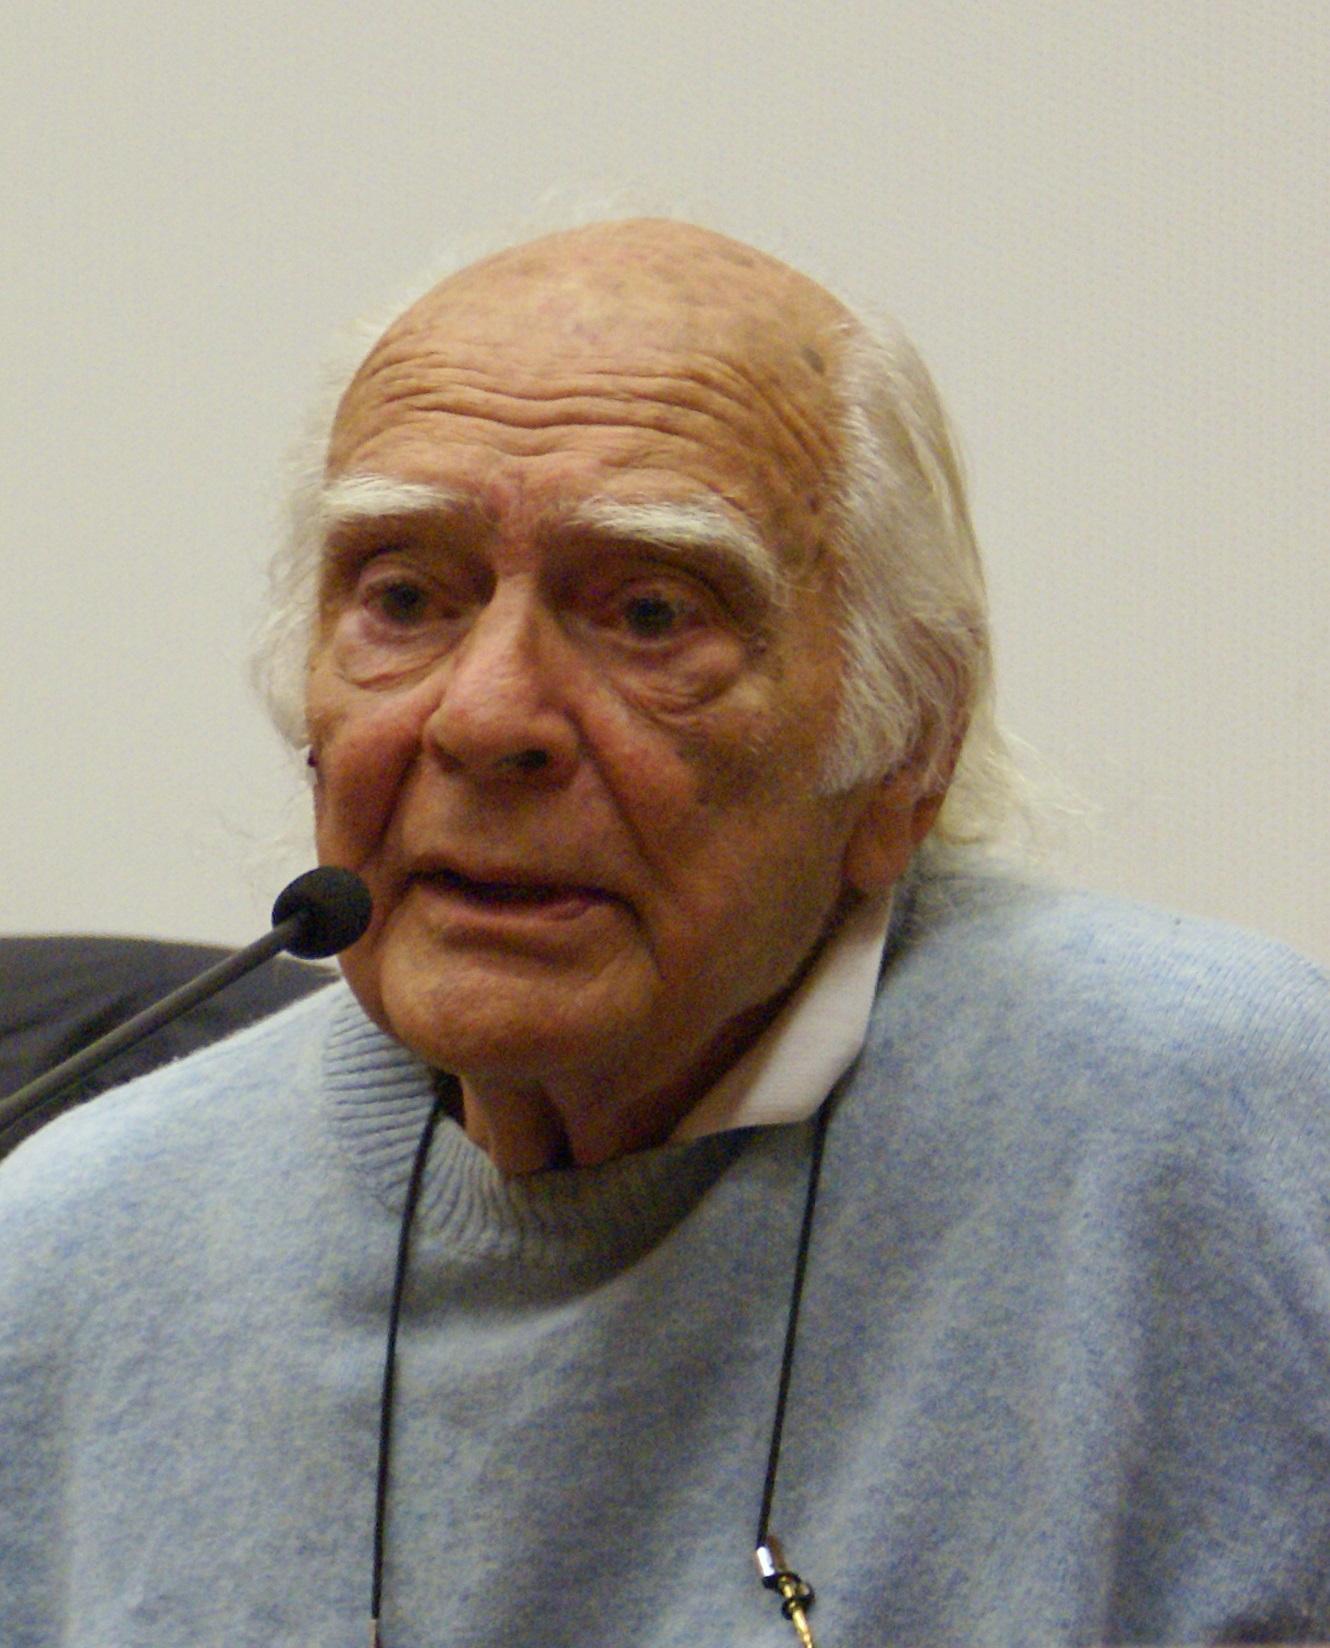 Depiction of Antonio Isasi-Isasmendi